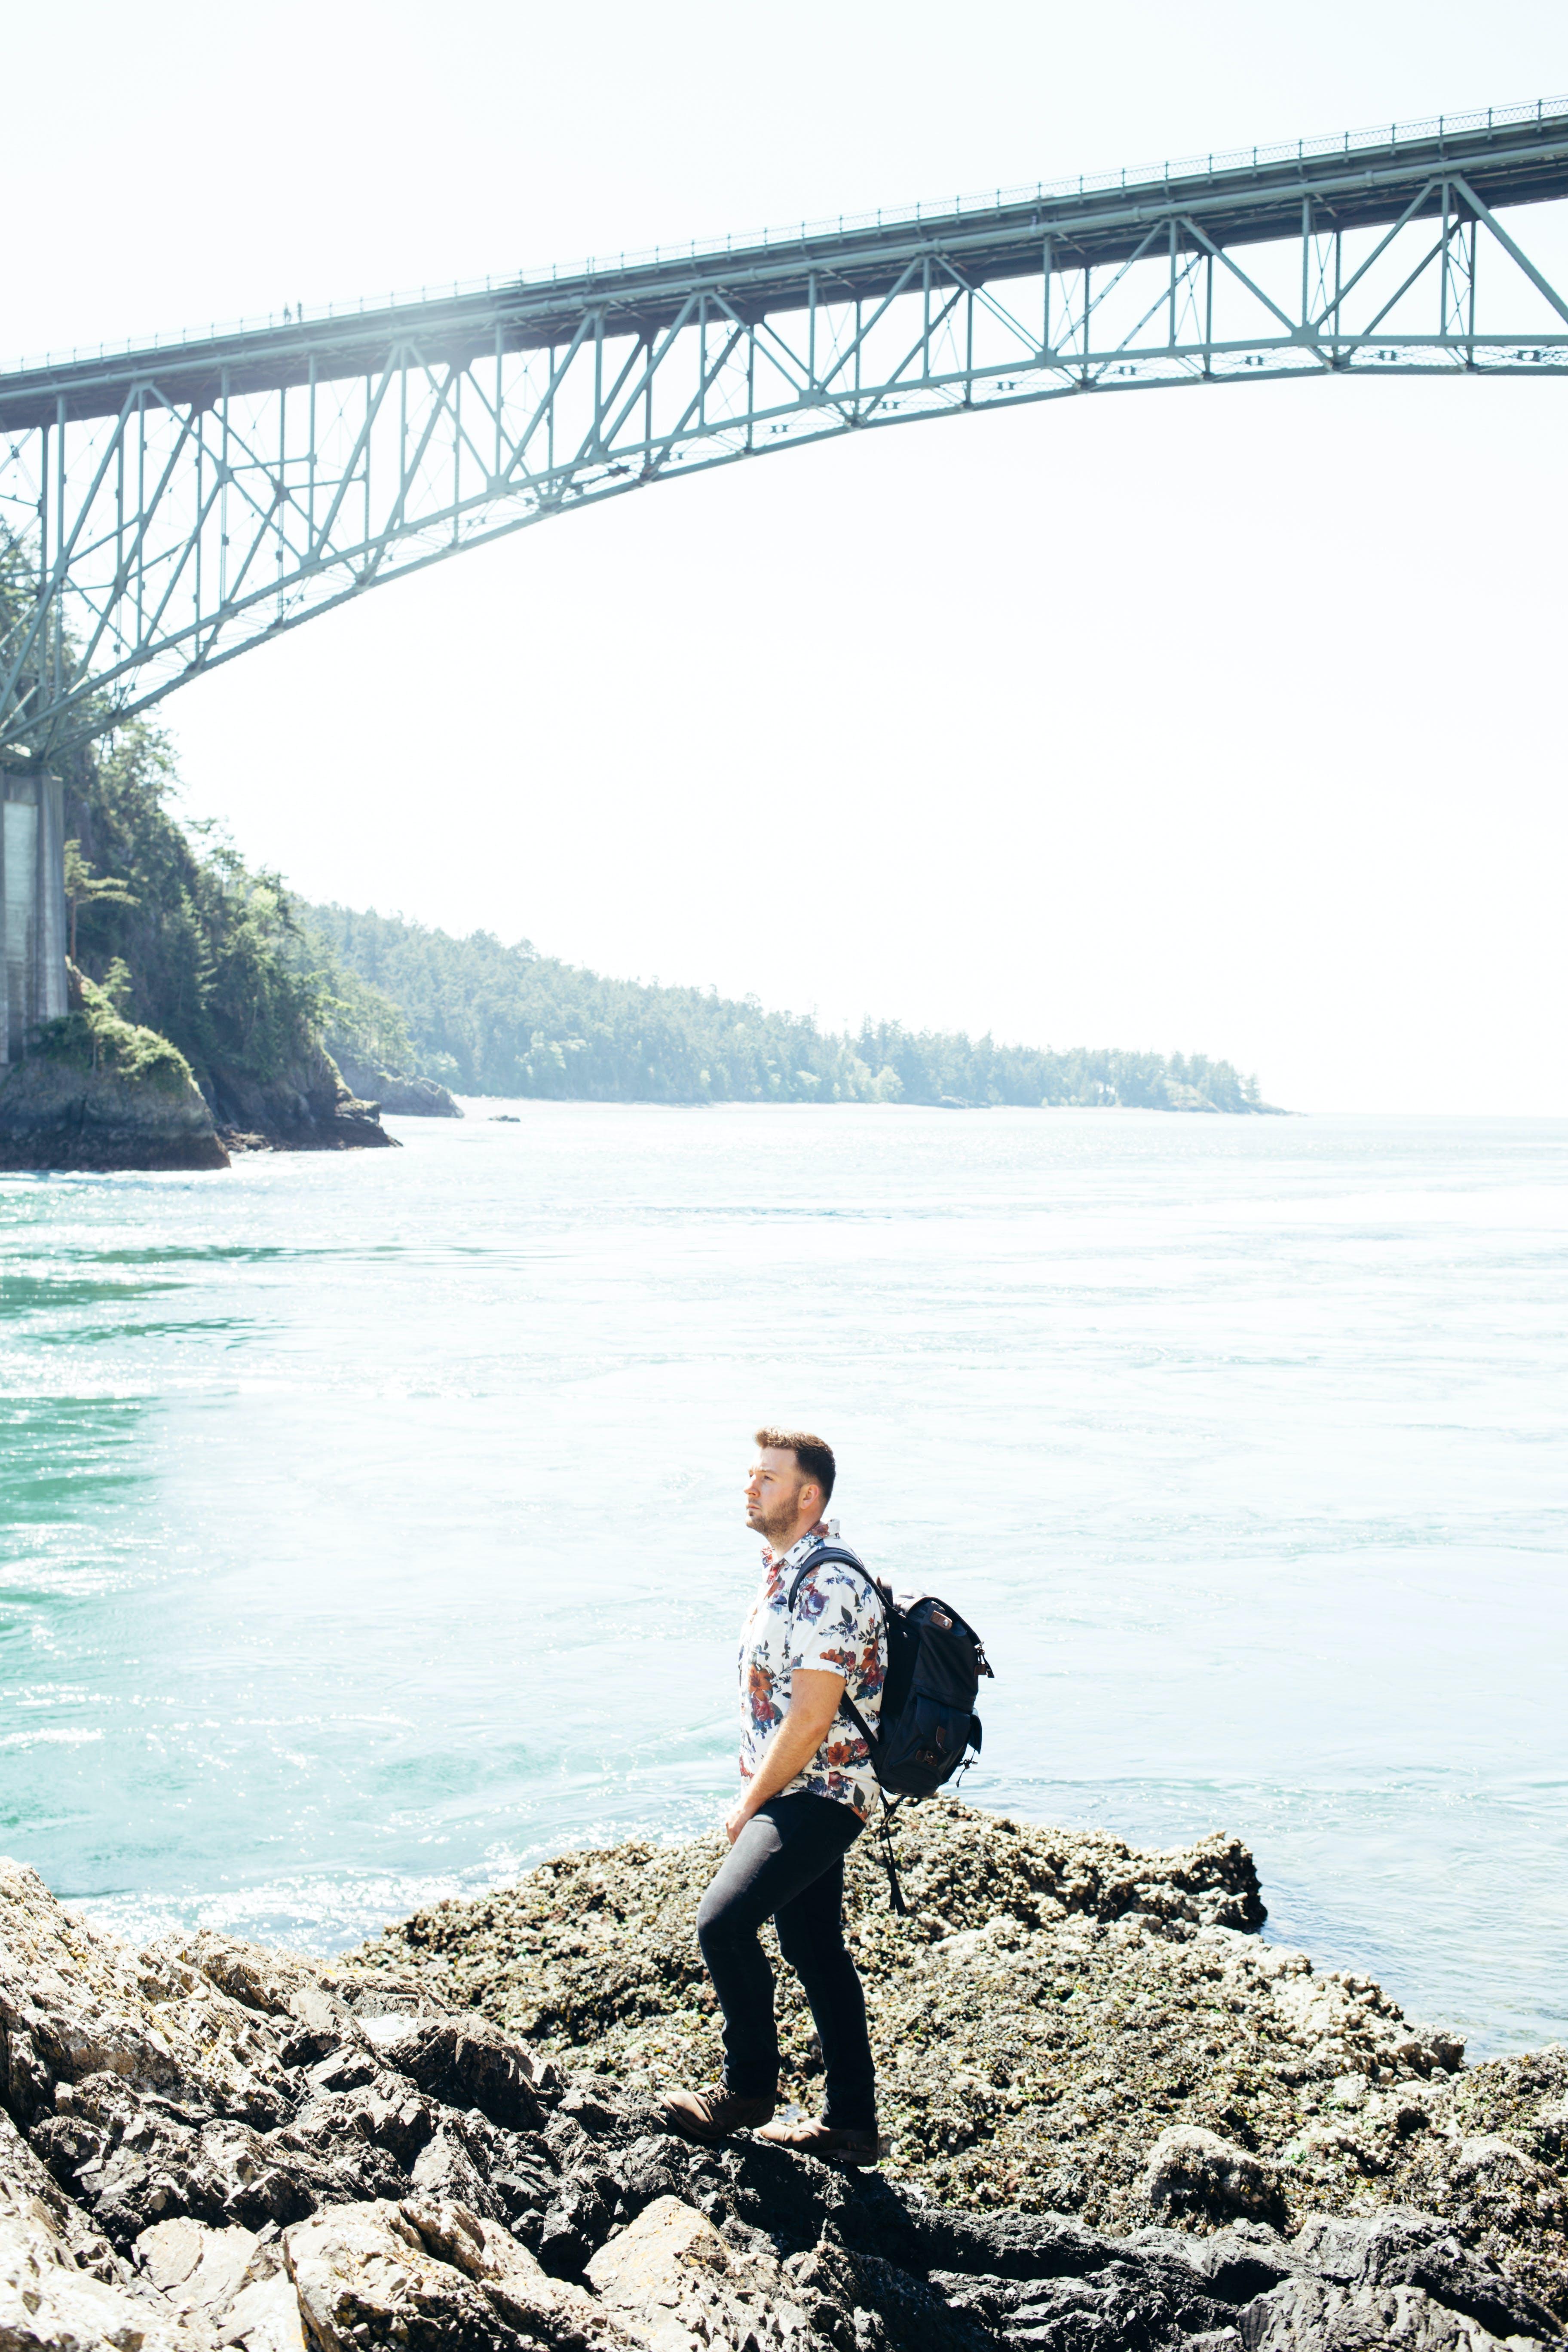 Man Standing on Gray Rock Near Gray Bridge Above Body of Water